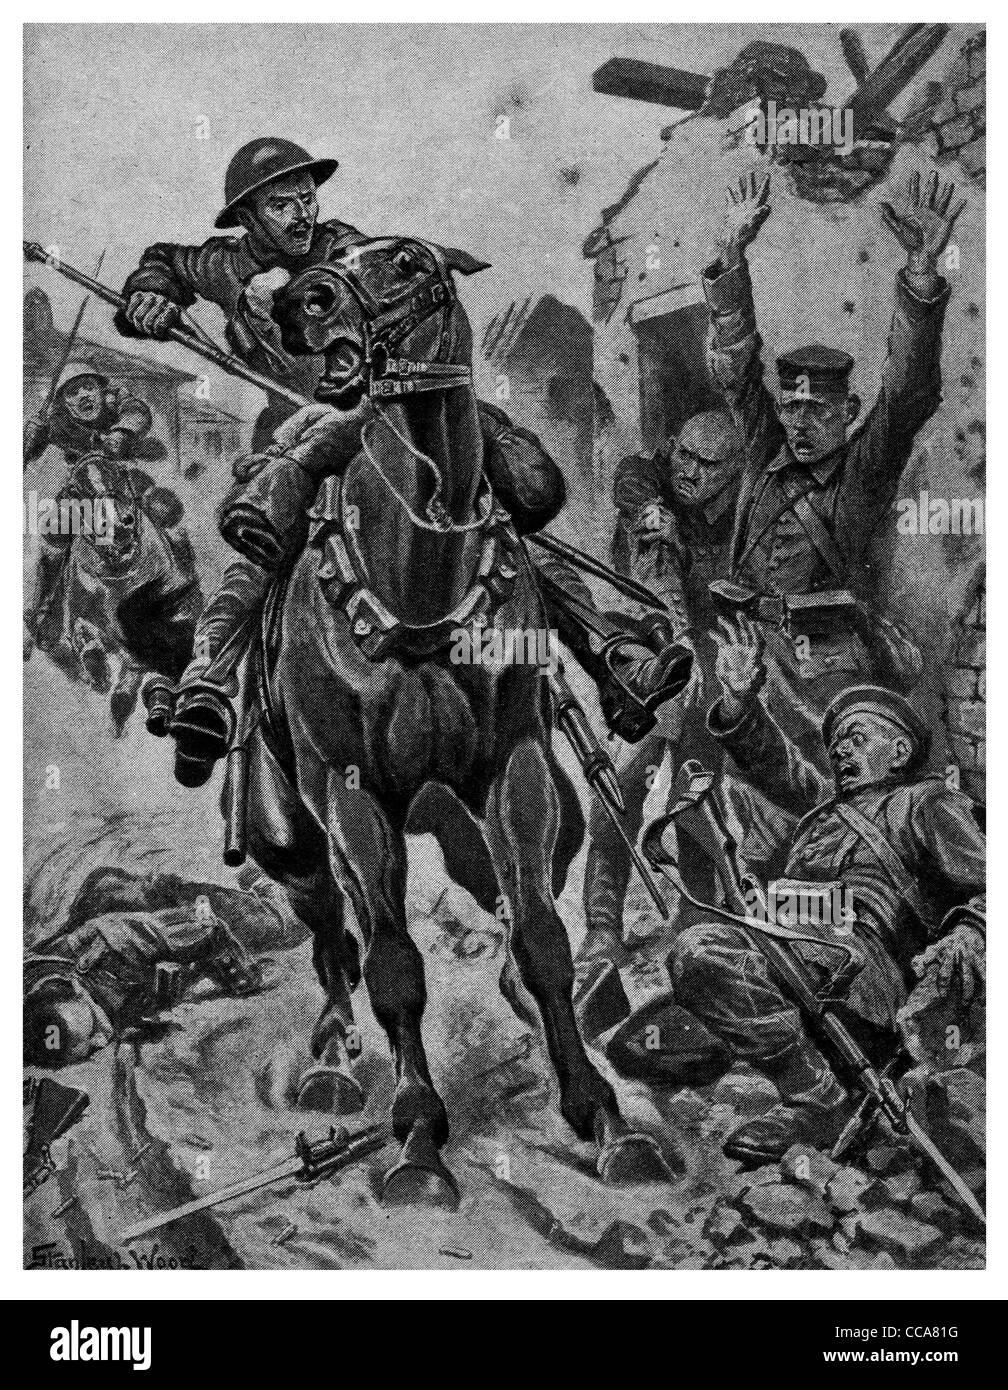 1917 British cavalry charging on German Hun charge saber lance bayonet rifle officer rubble terror shock horse saddle - Stock Image